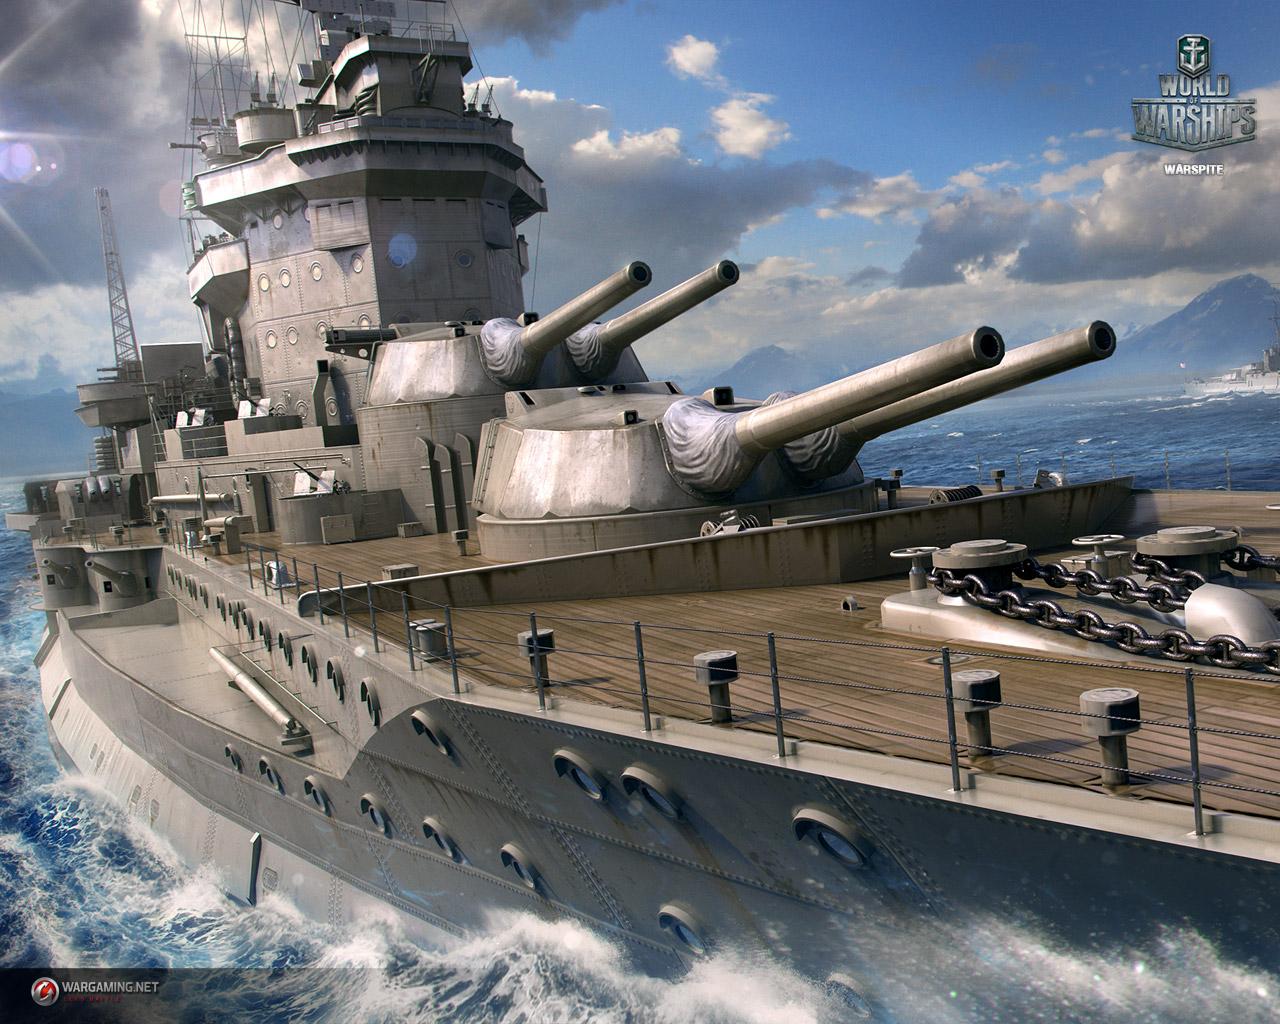 warspite-1280x1024jwjy4.jpg